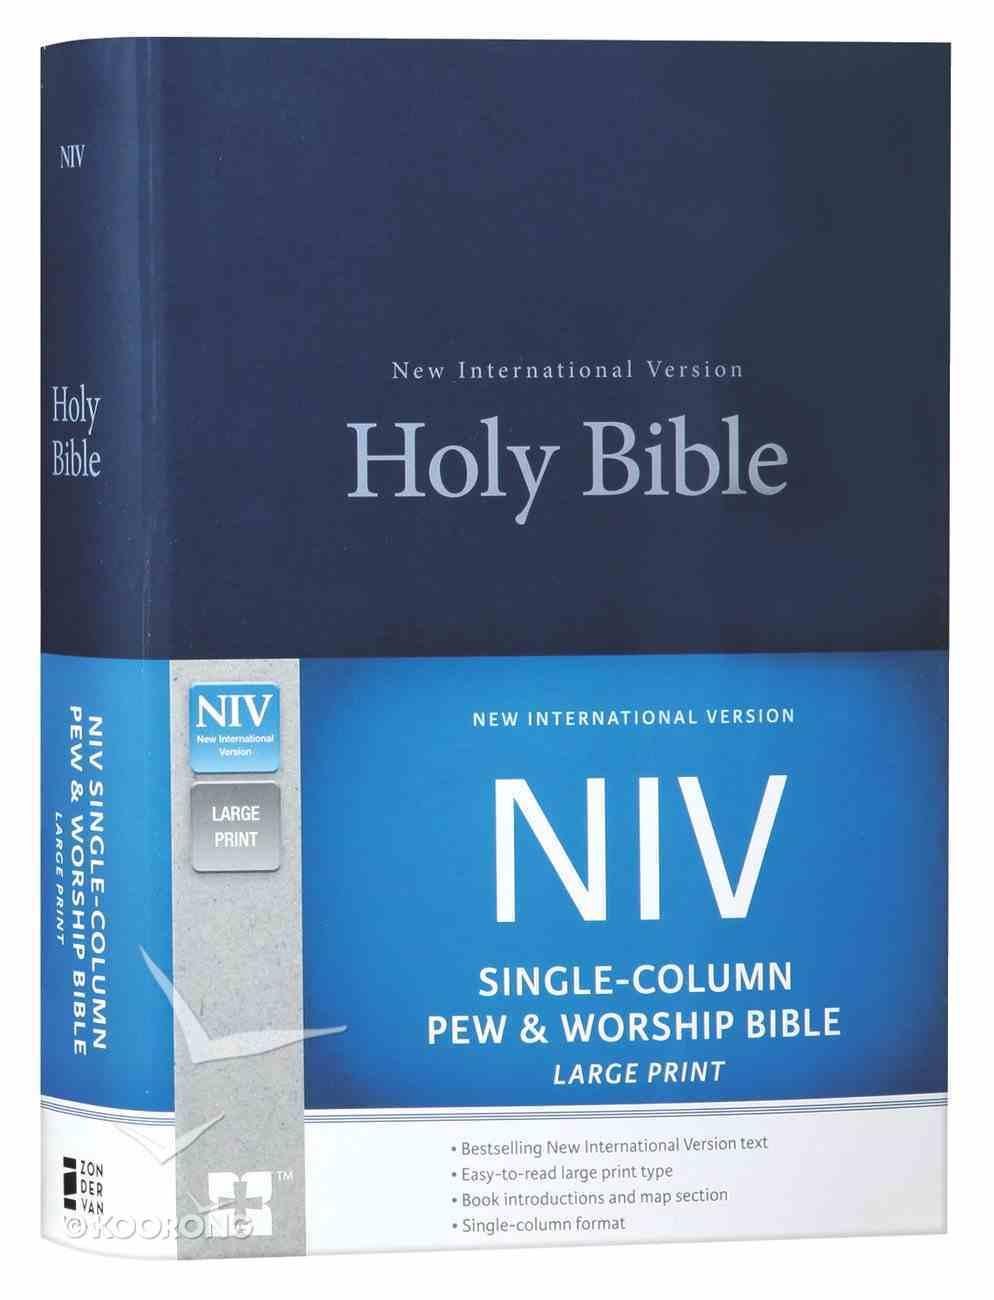 NIV Single-Column Pew and Worship Bible Large Print Blue (Black Letter Edition) Hardback